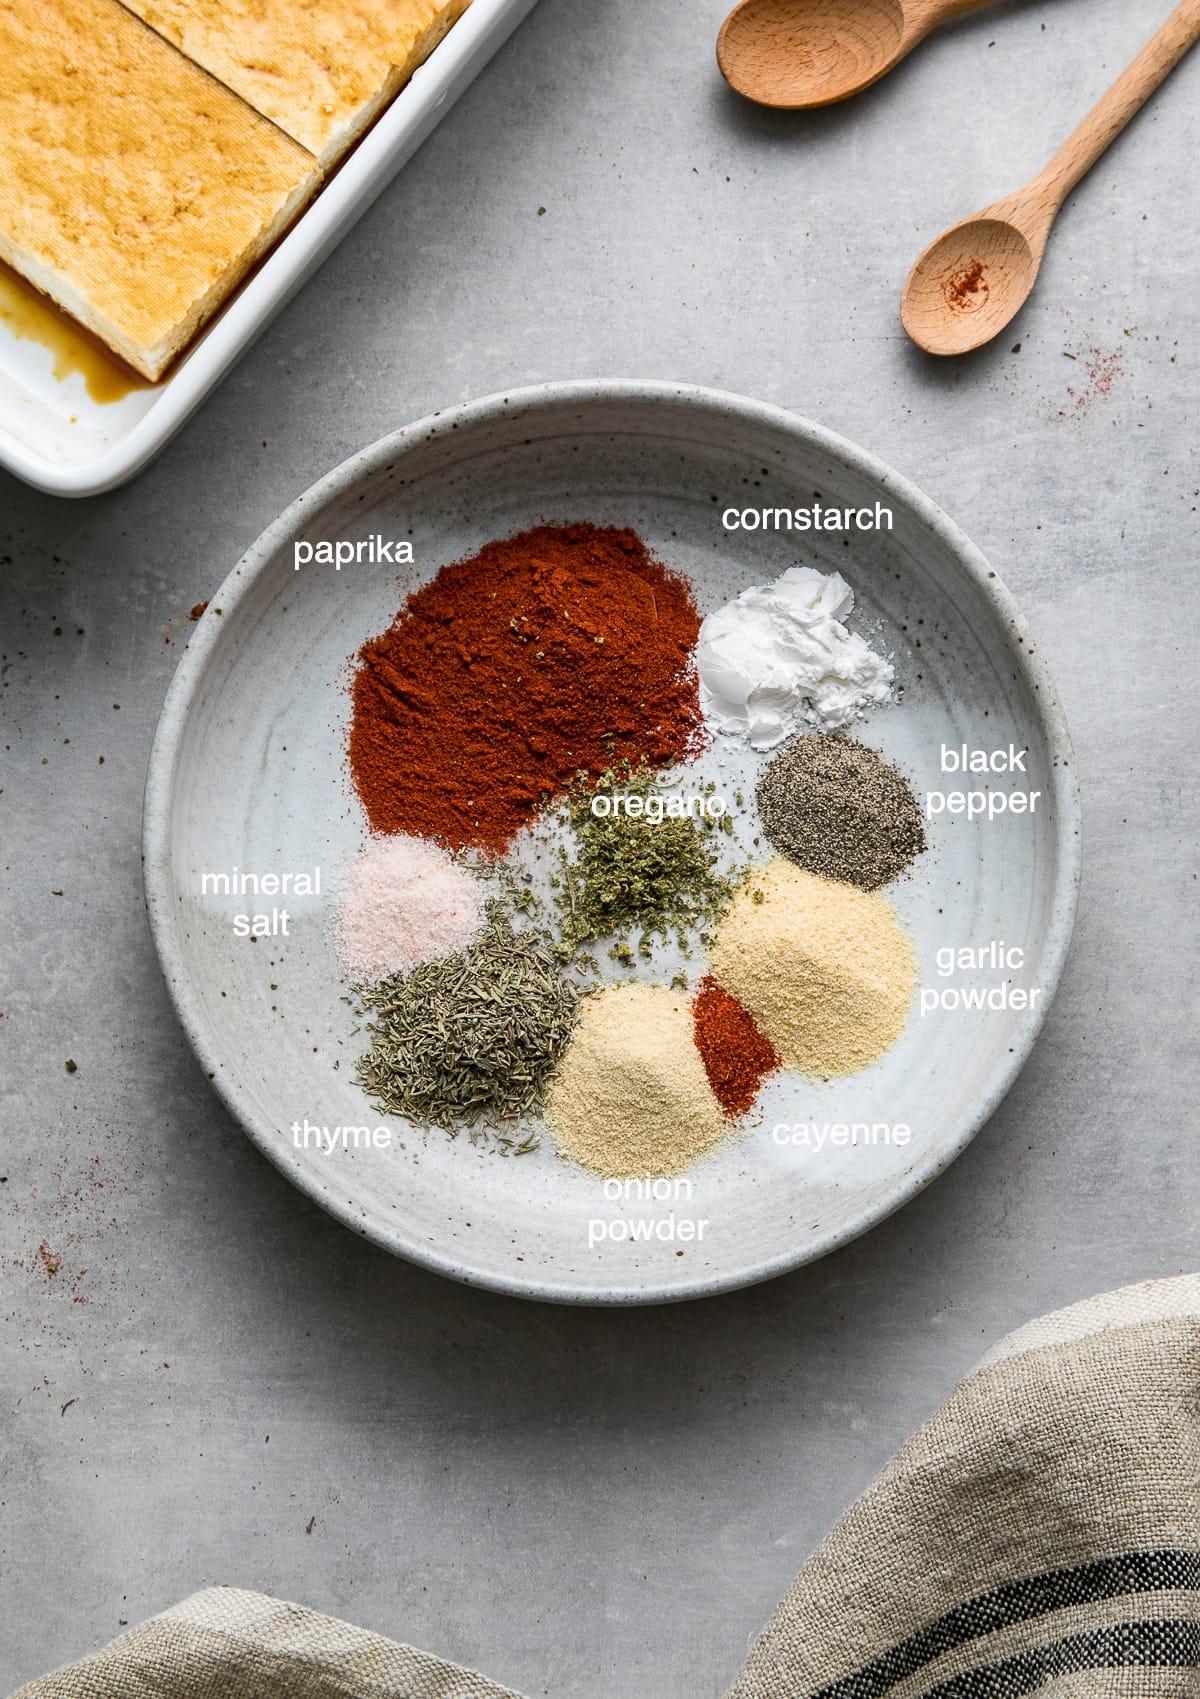 top down view of ingredients used to make blackened tofu